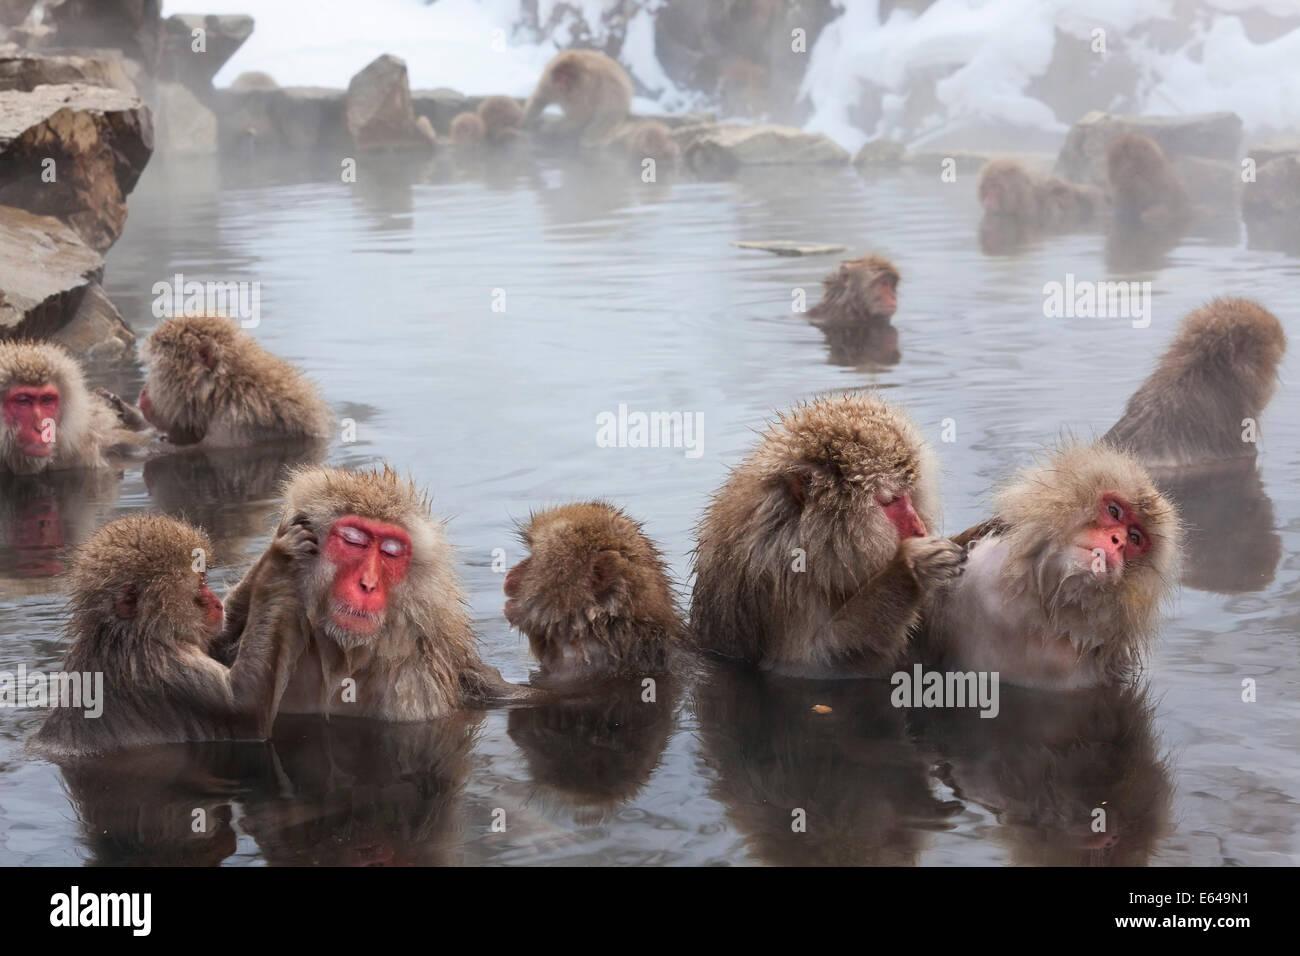 Macaque giapponese (Macaca fuscata)/ Snow monkey, Joshin-etsu National Park, Honshu, Giappone Immagini Stock